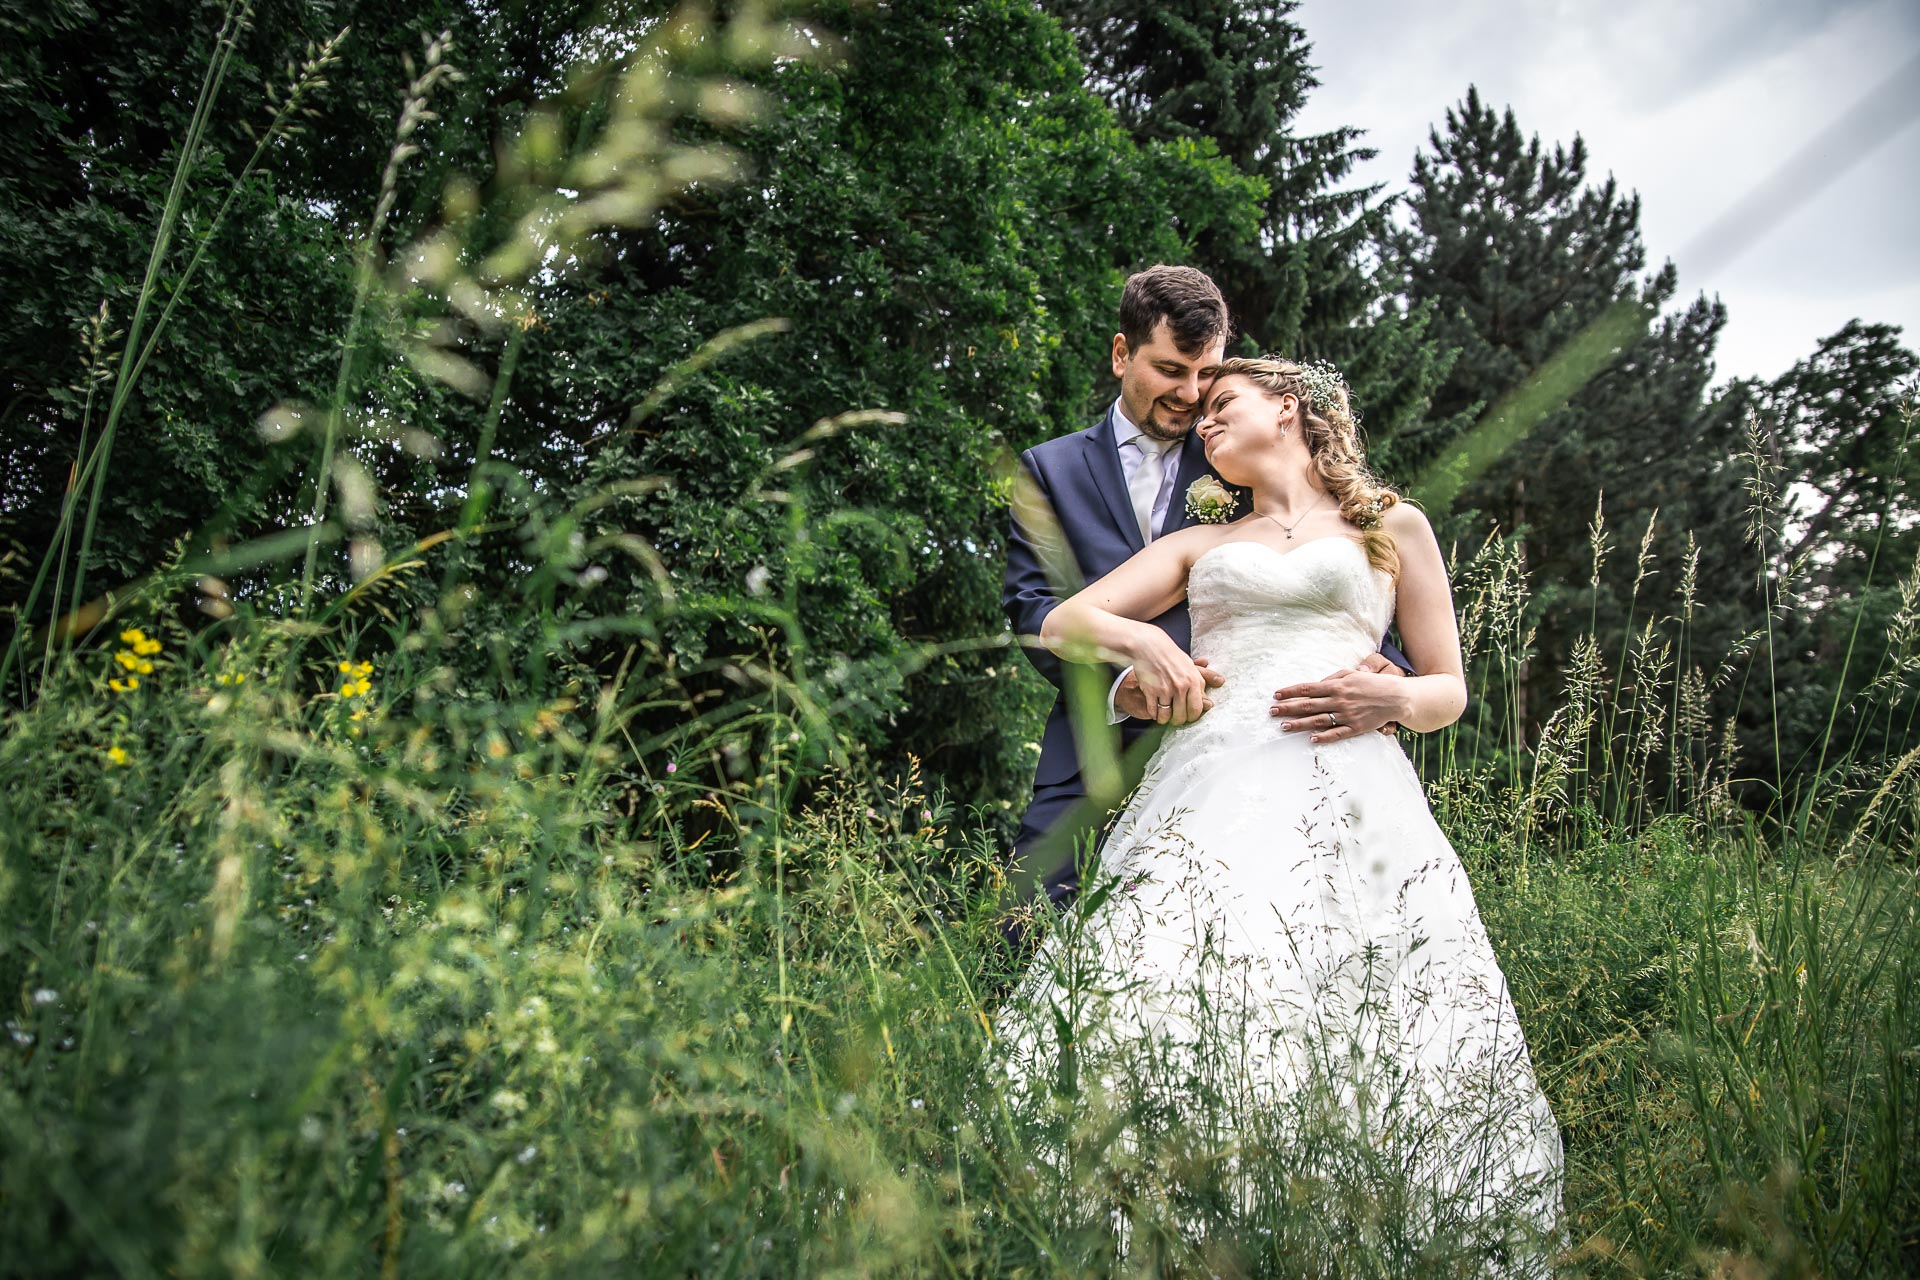 Svatební-fotograf-Nymburk-6114